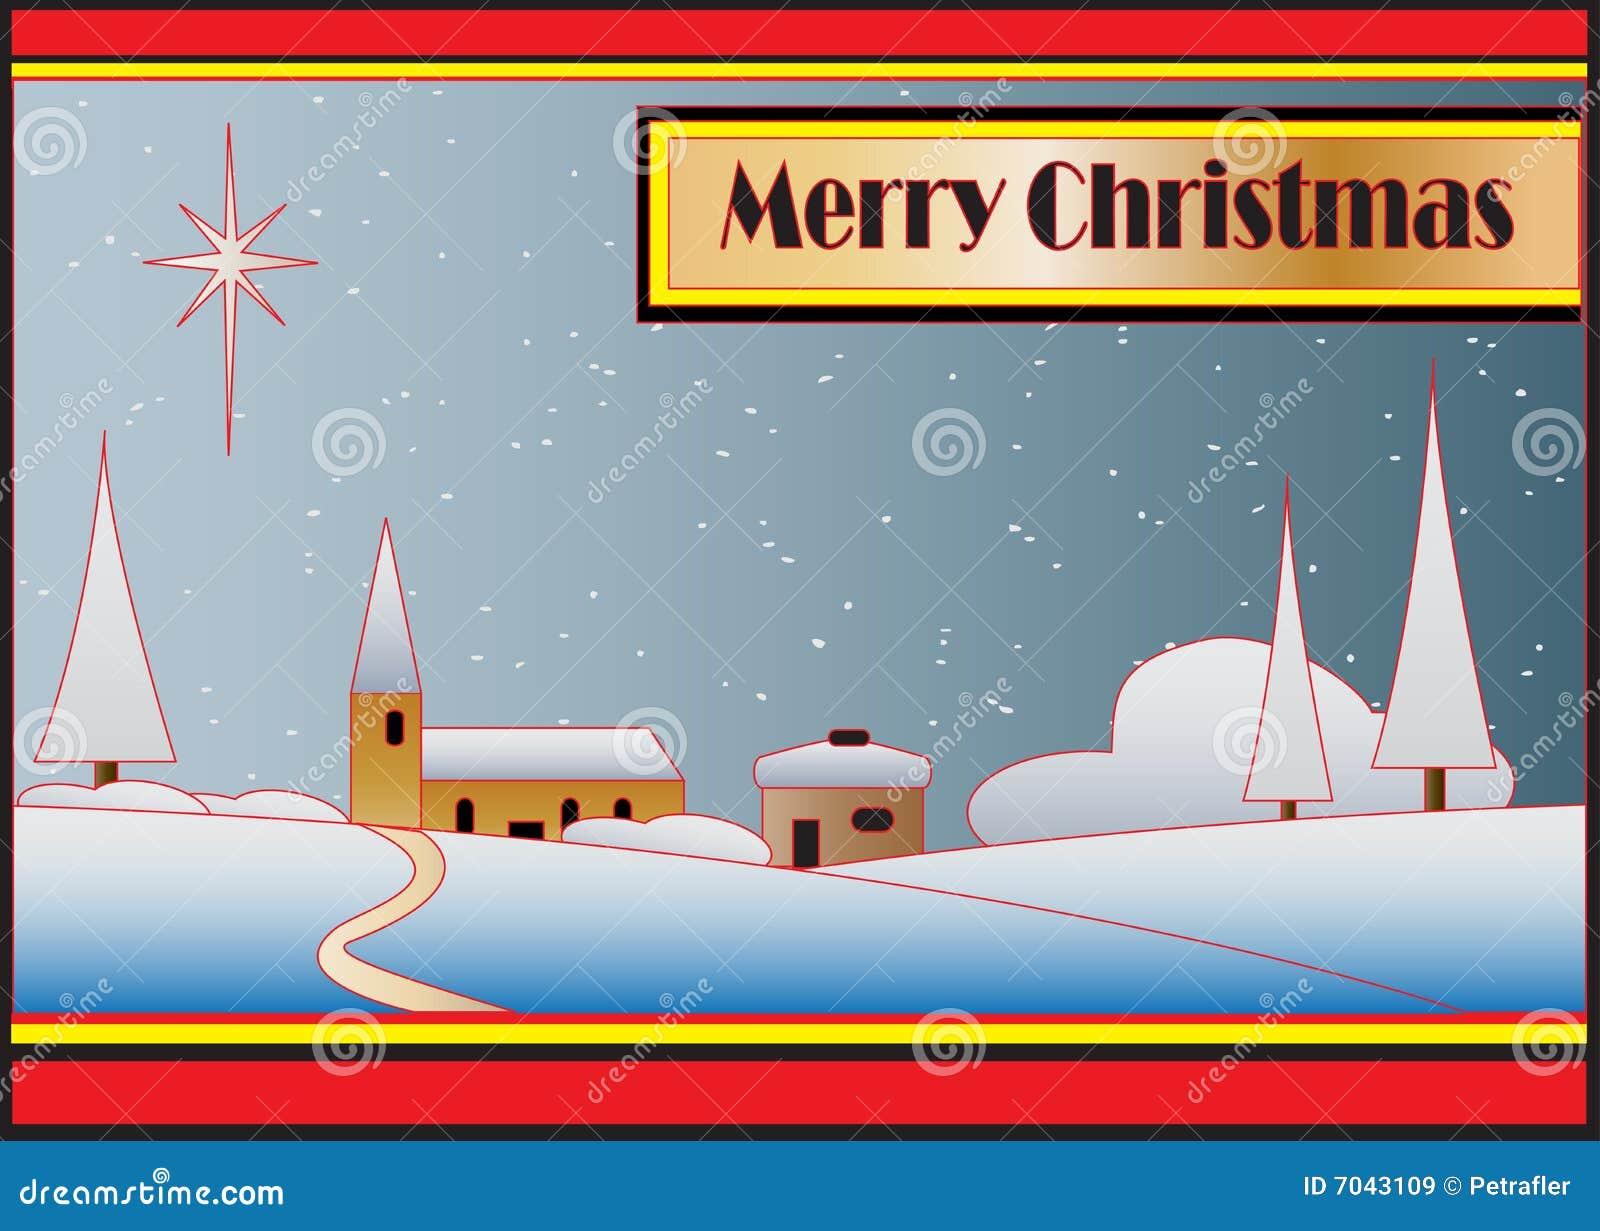 Art Deco Christmas Card stock vector. Illustration of vintage - 7043109